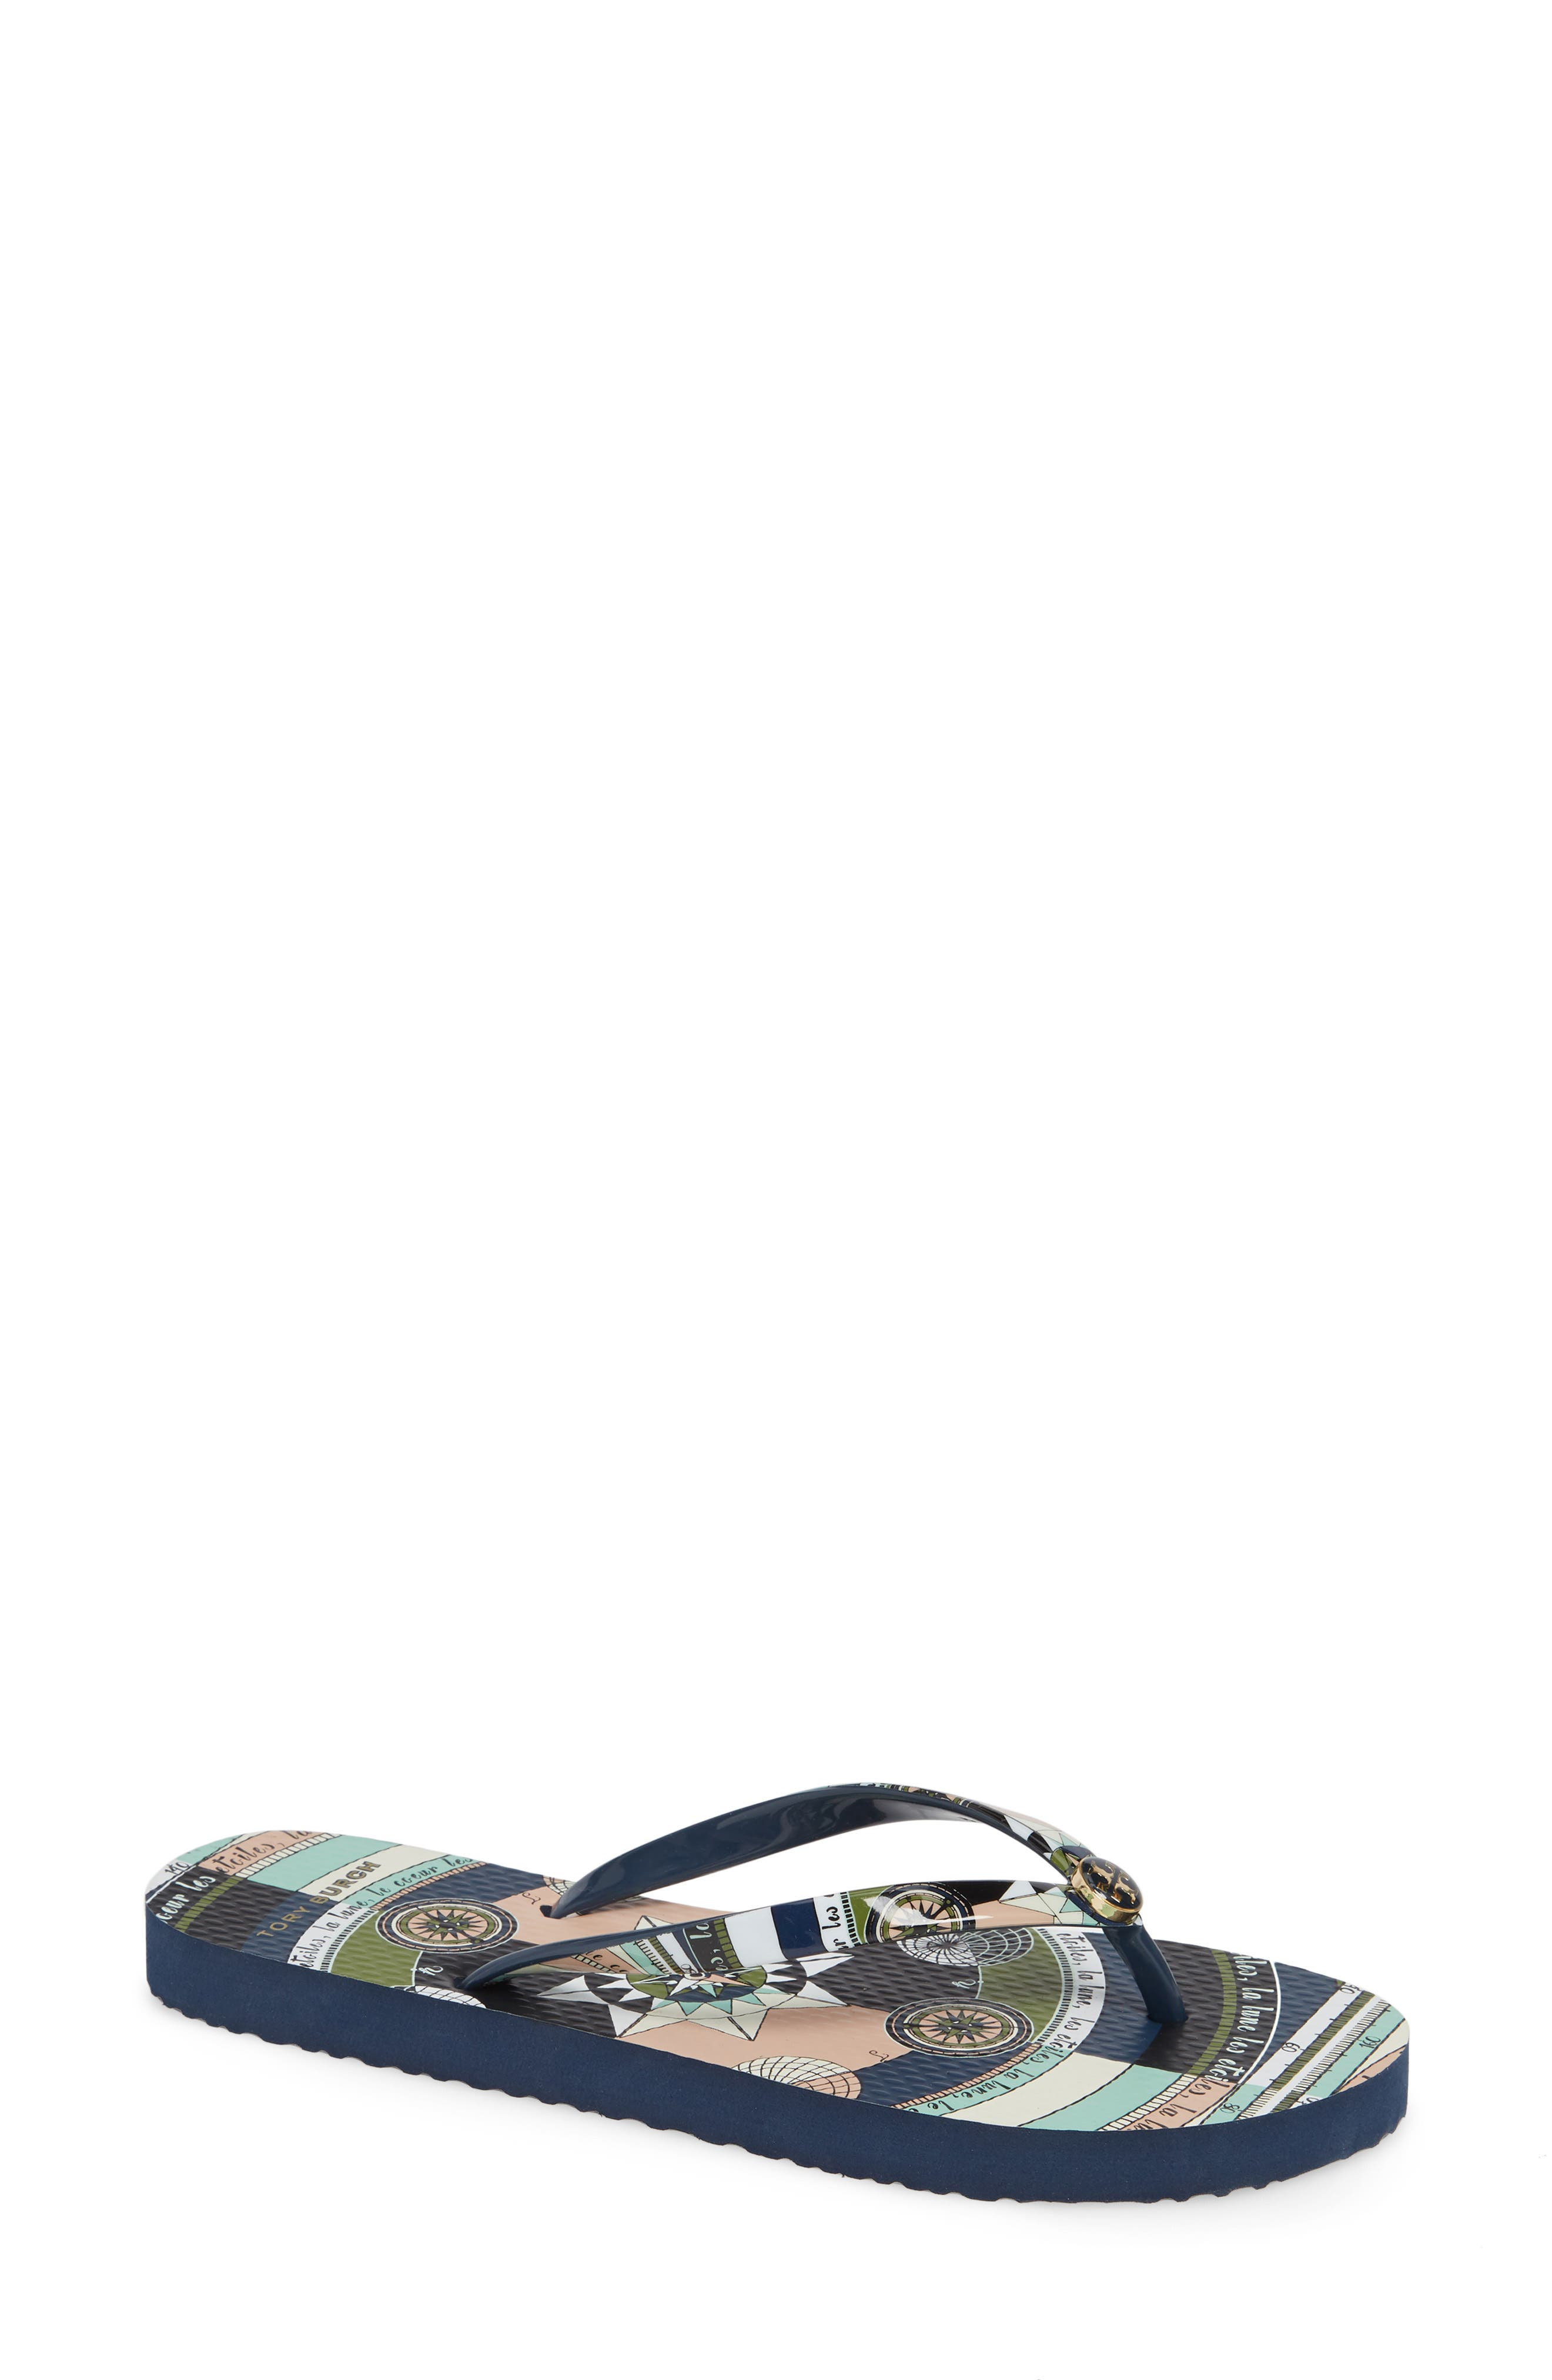 Thin Flip Flop, Main, color, NAVY CONSTELLATION